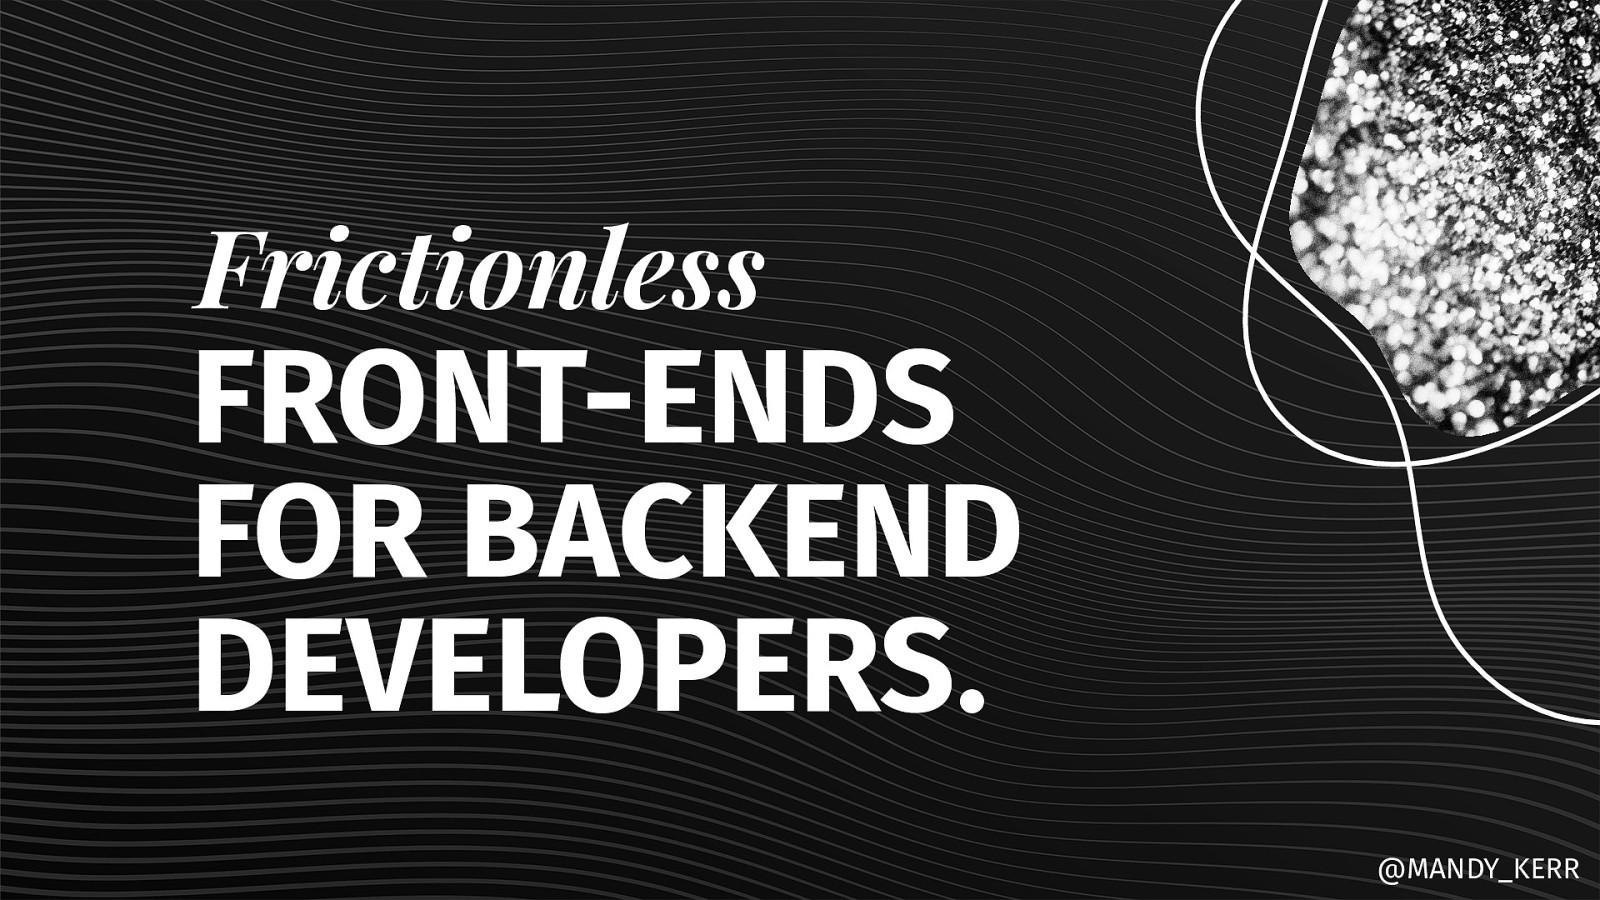 Frictionless Front Ends for Back End Developers